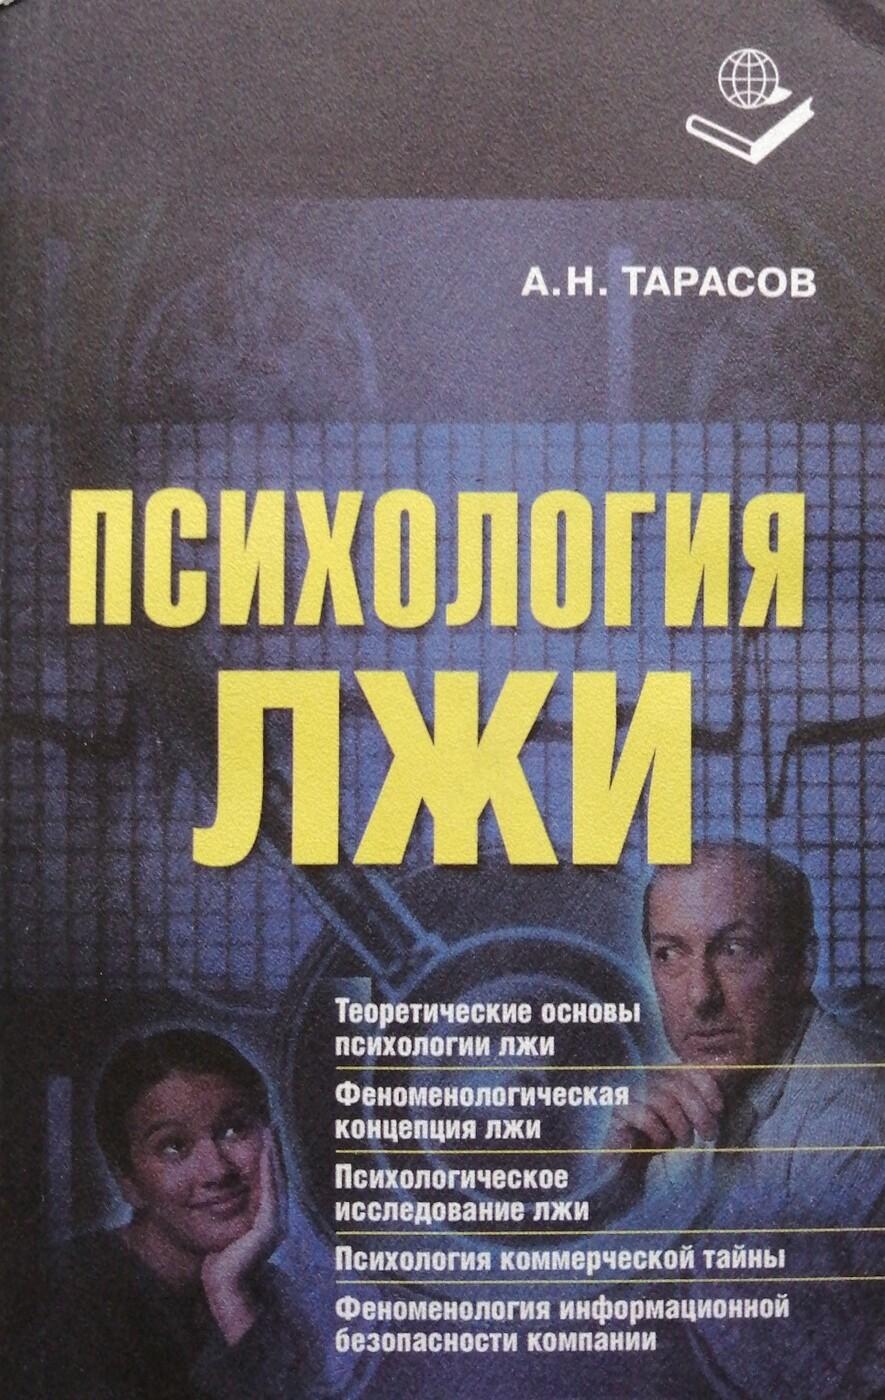 А. Н. Тарасов. Психология лжи